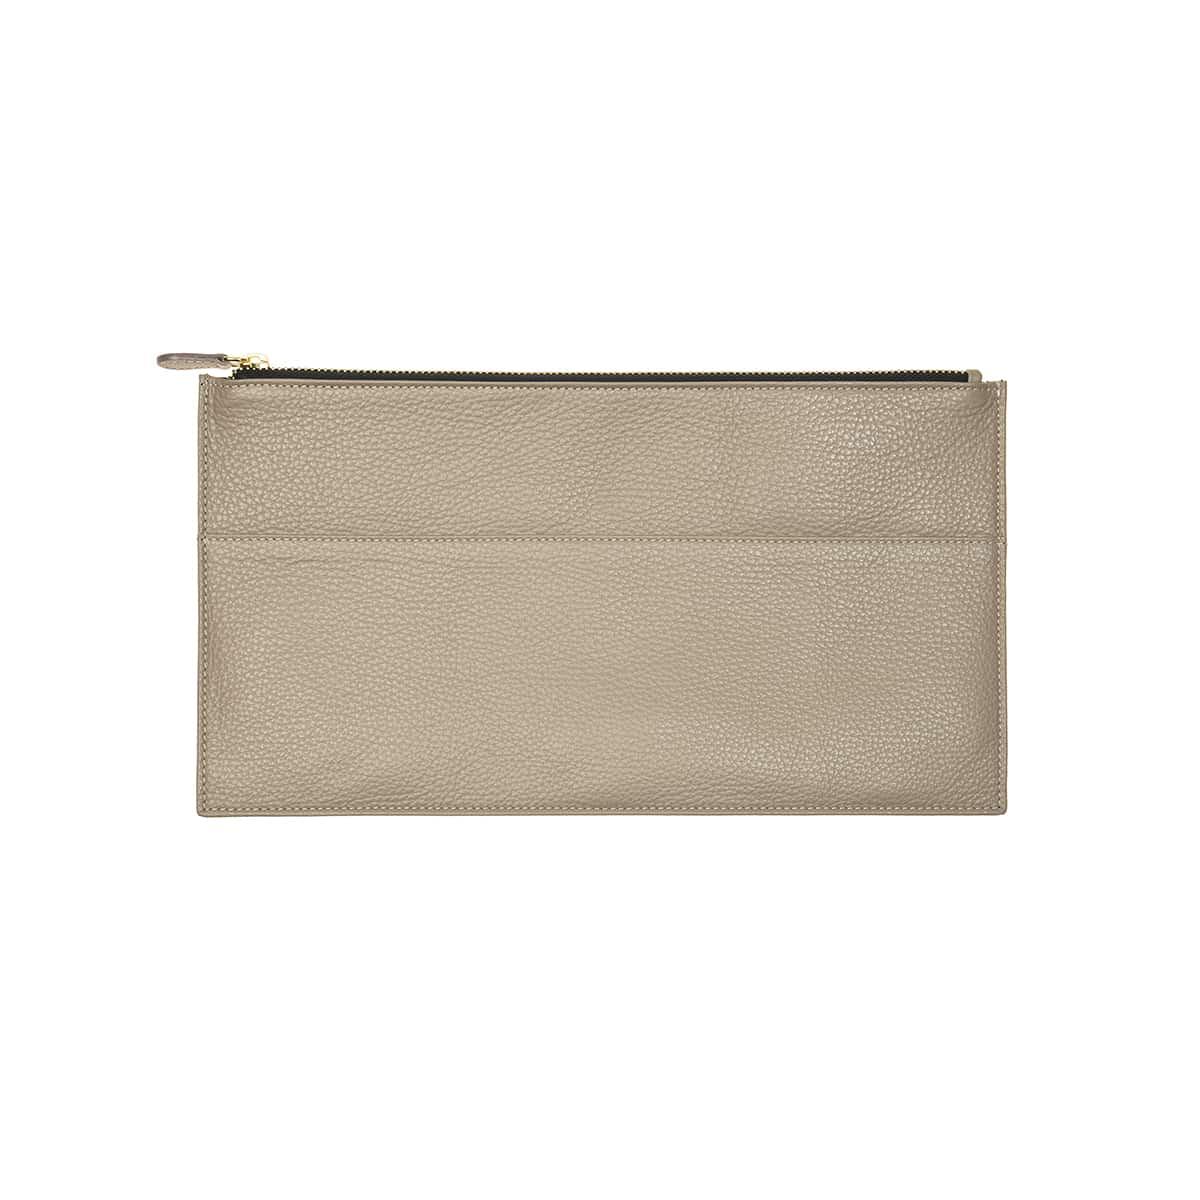 Pochette plate  cuir handmade taupe CORALIE DE SEYNES L'Erudite Concept Store